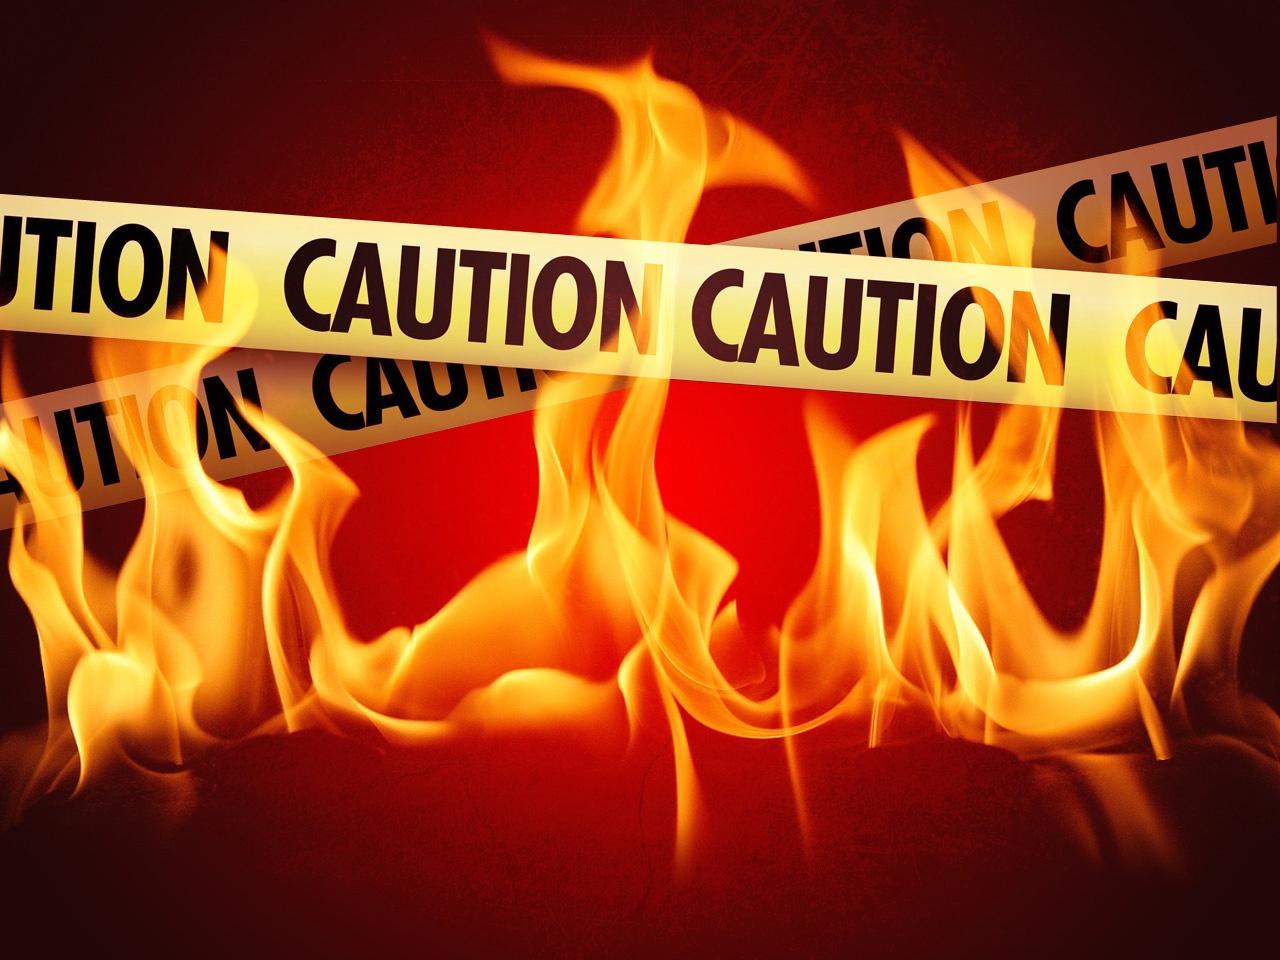 Fire investigation__1540487454271.jpg.jpg